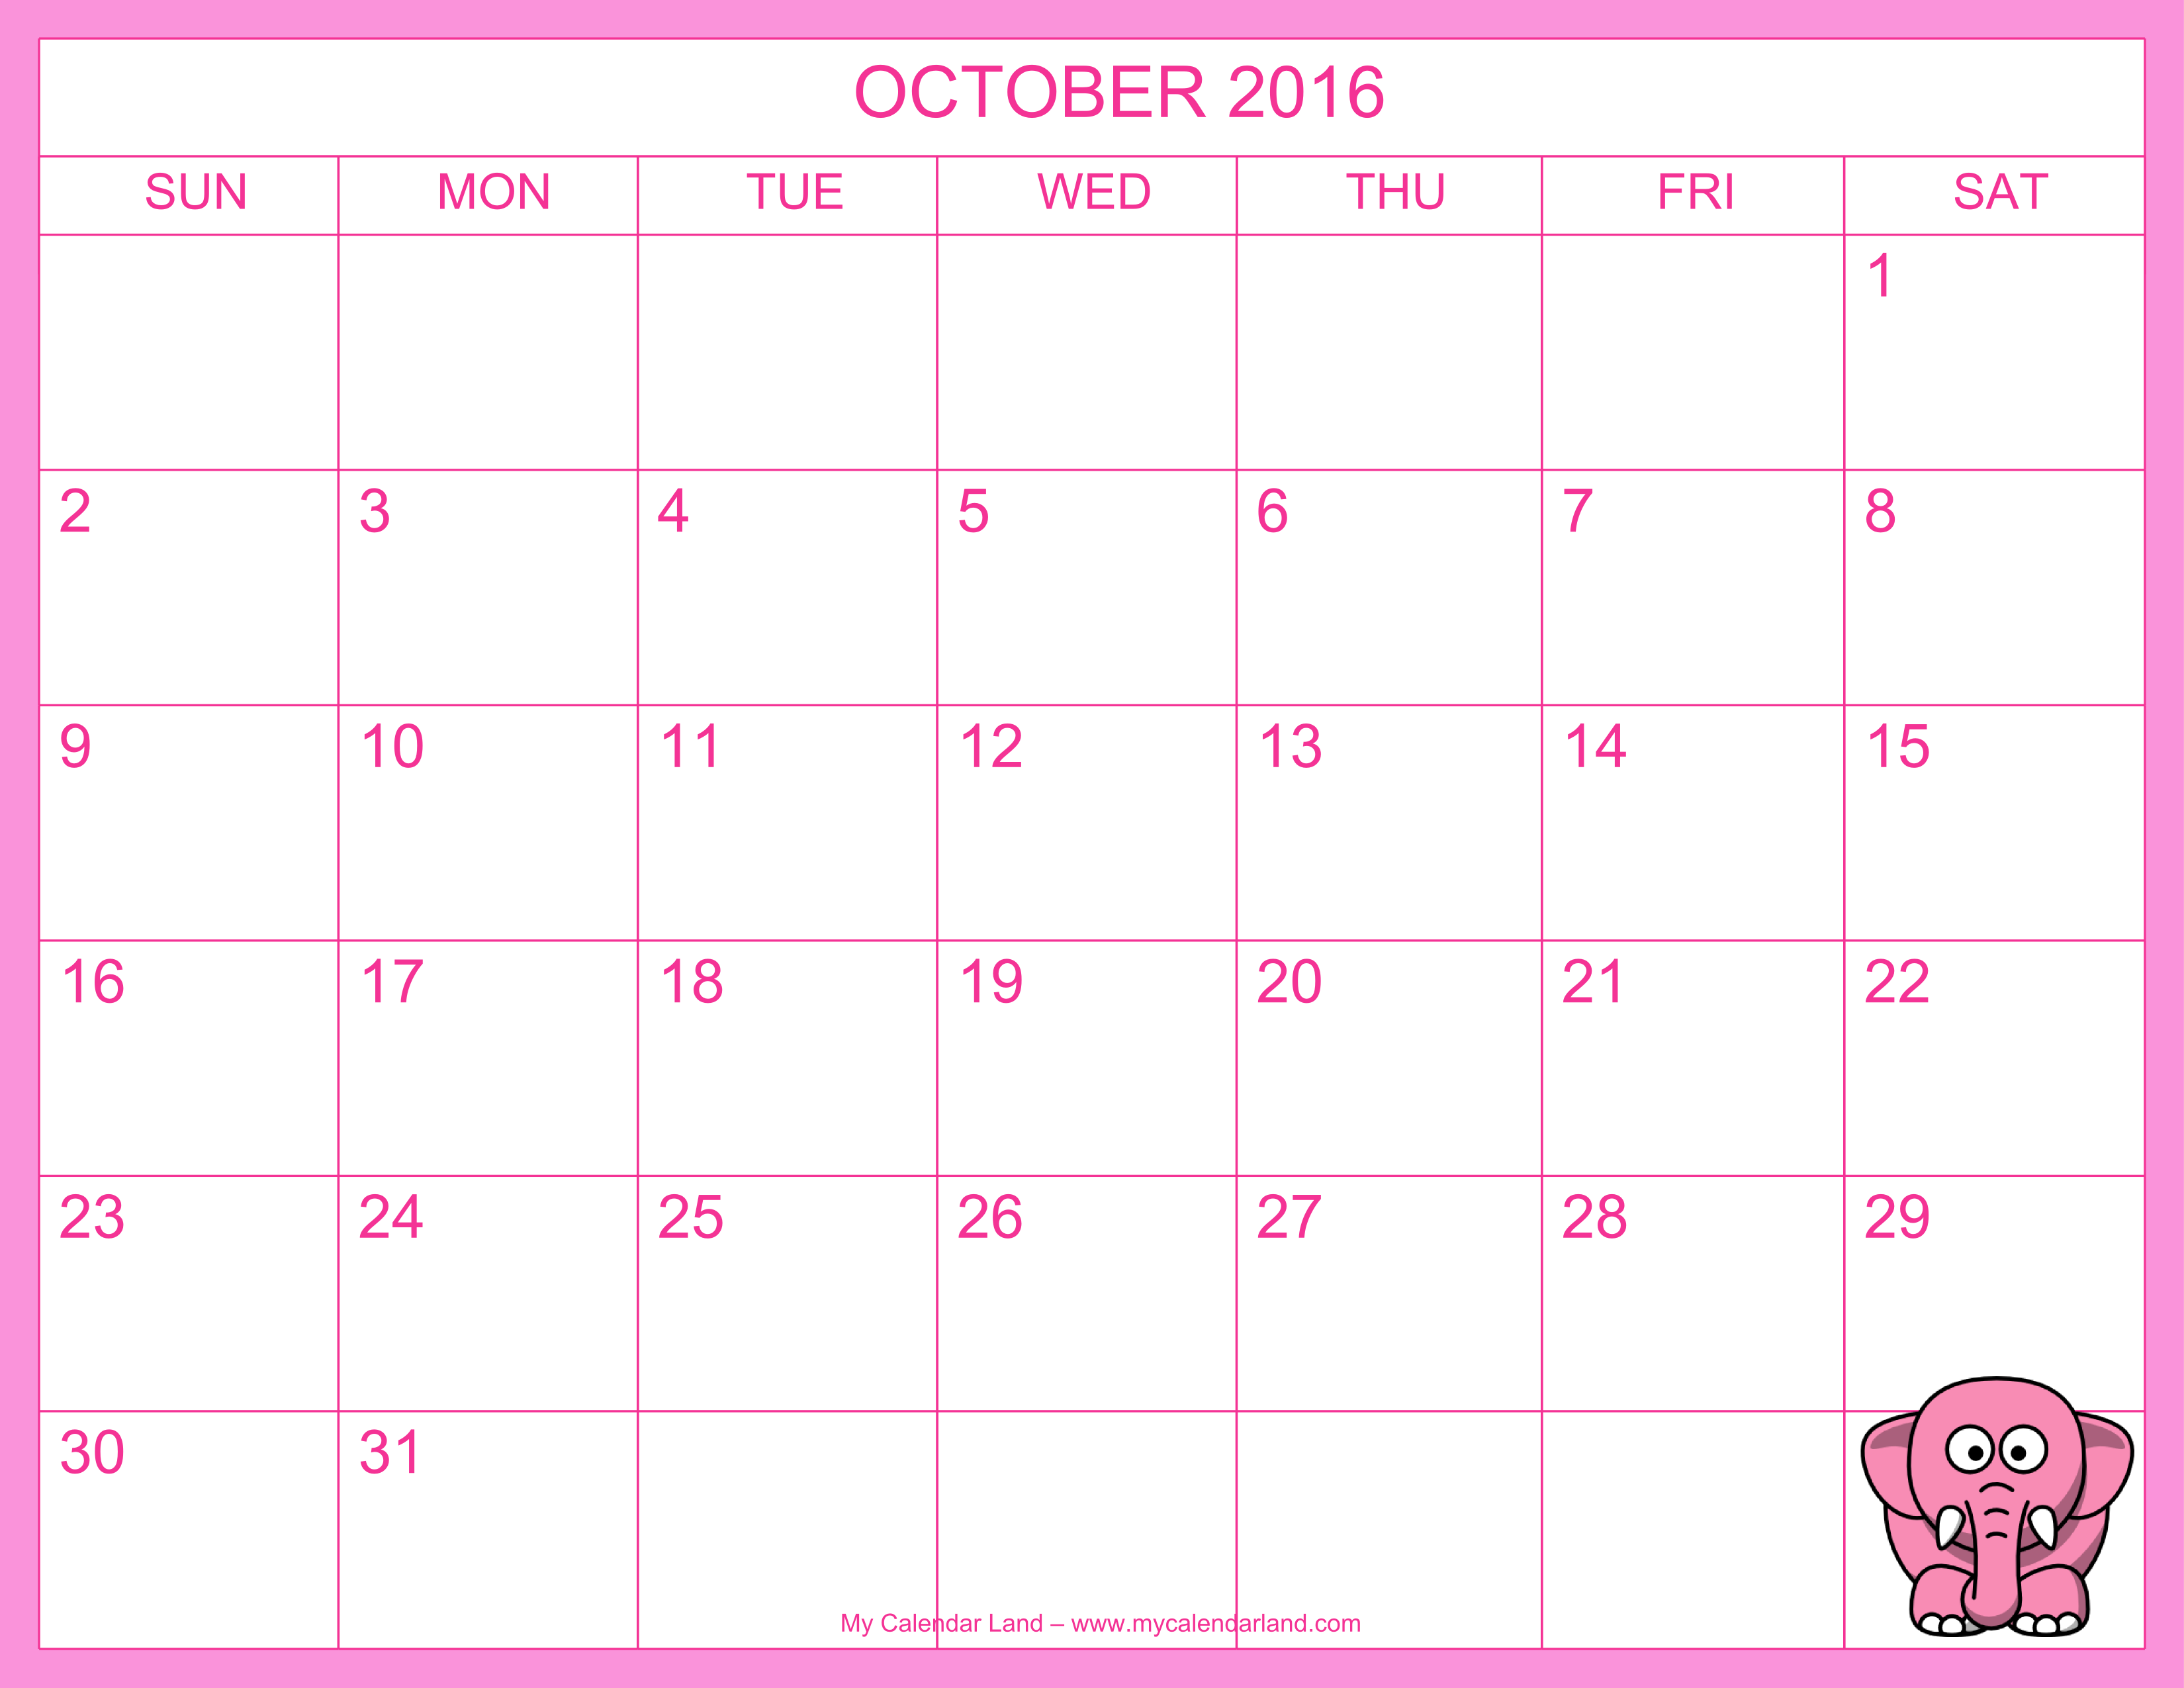 October 2016 Calendar My Calendar Land